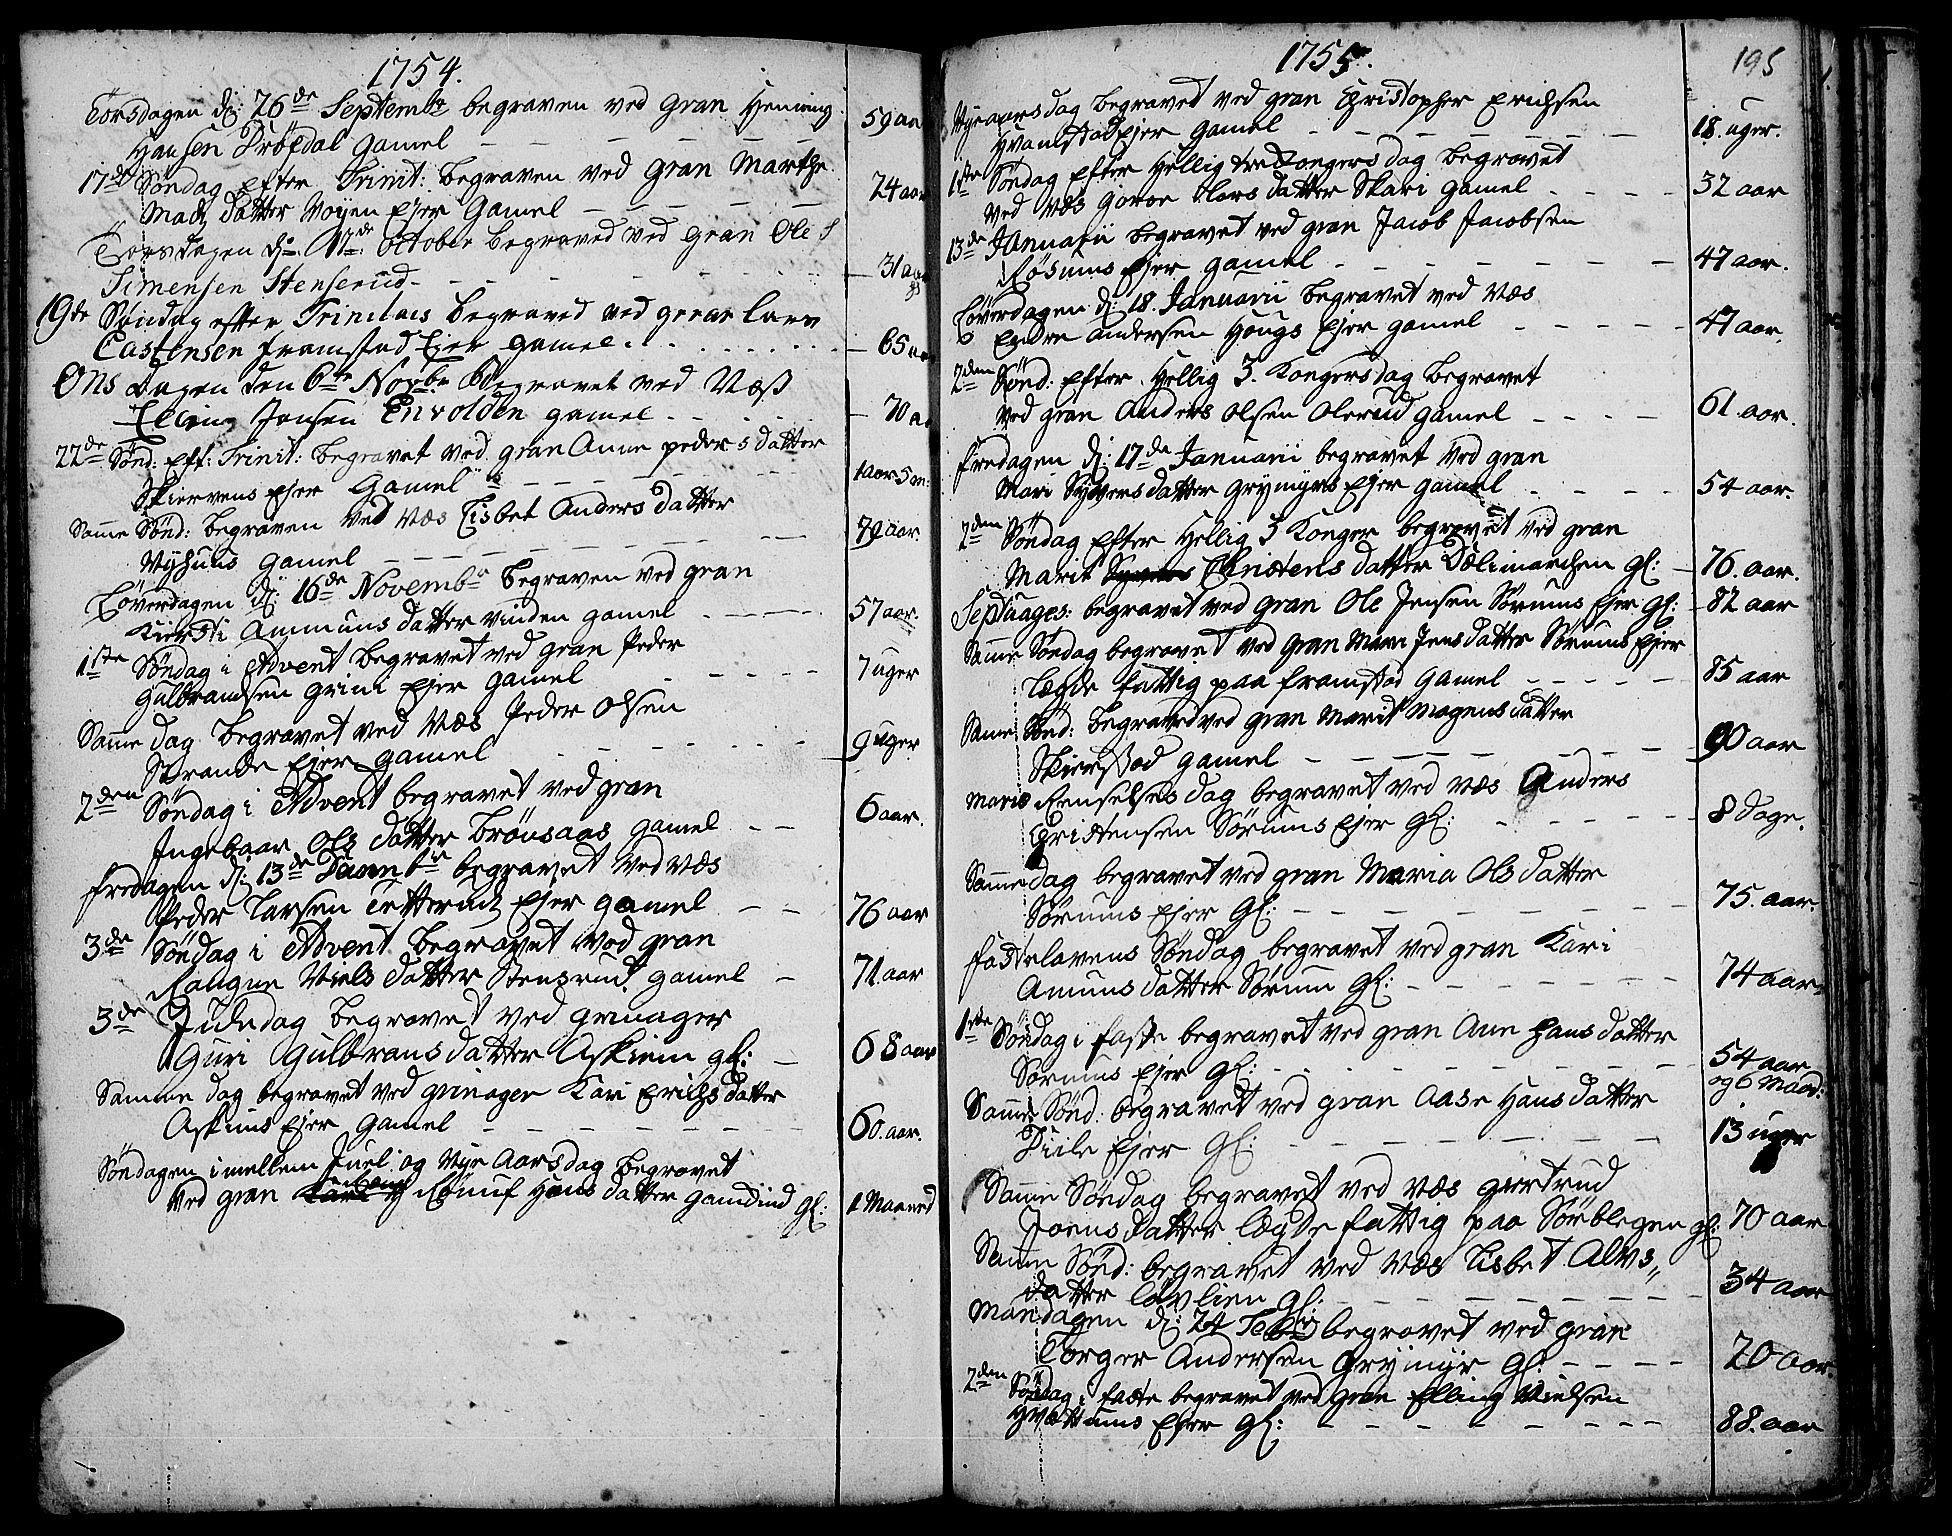 SAH, Gran prestekontor, Ministerialbok nr. 3, 1745-1758, s. 195